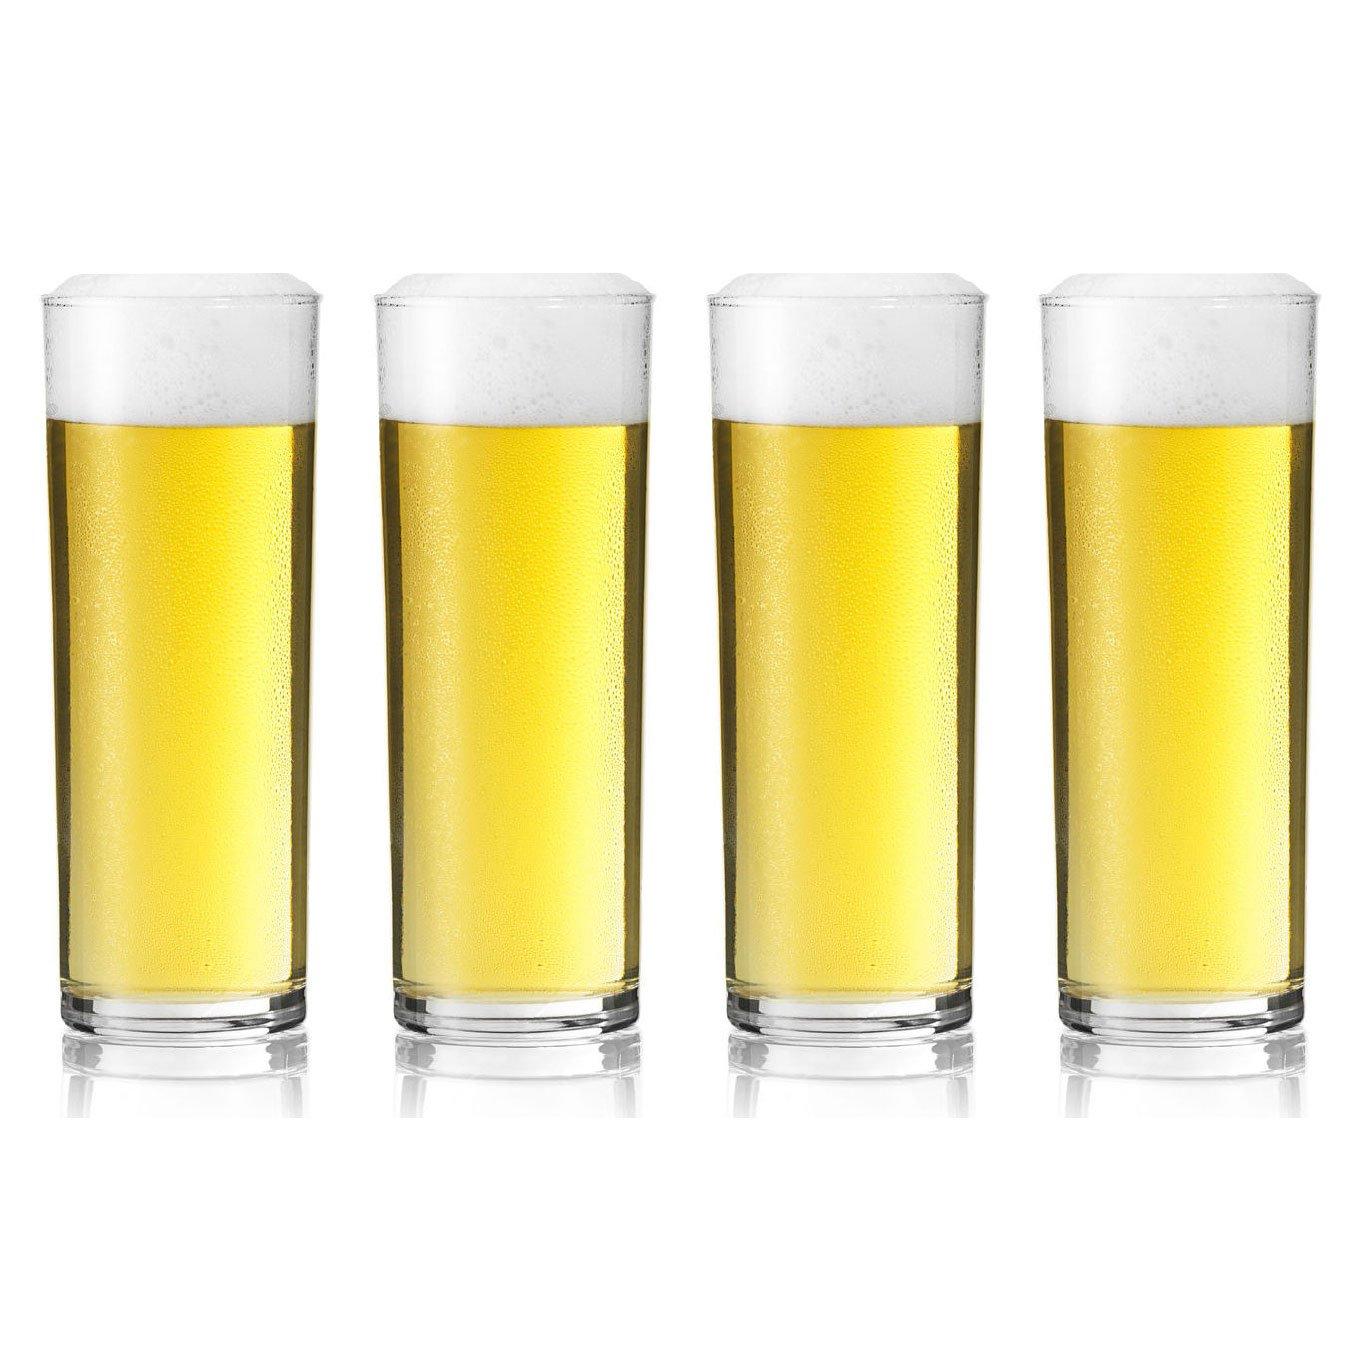 Stange Kolsch German Beer Glass - 200ml - Set of 4 Glasses